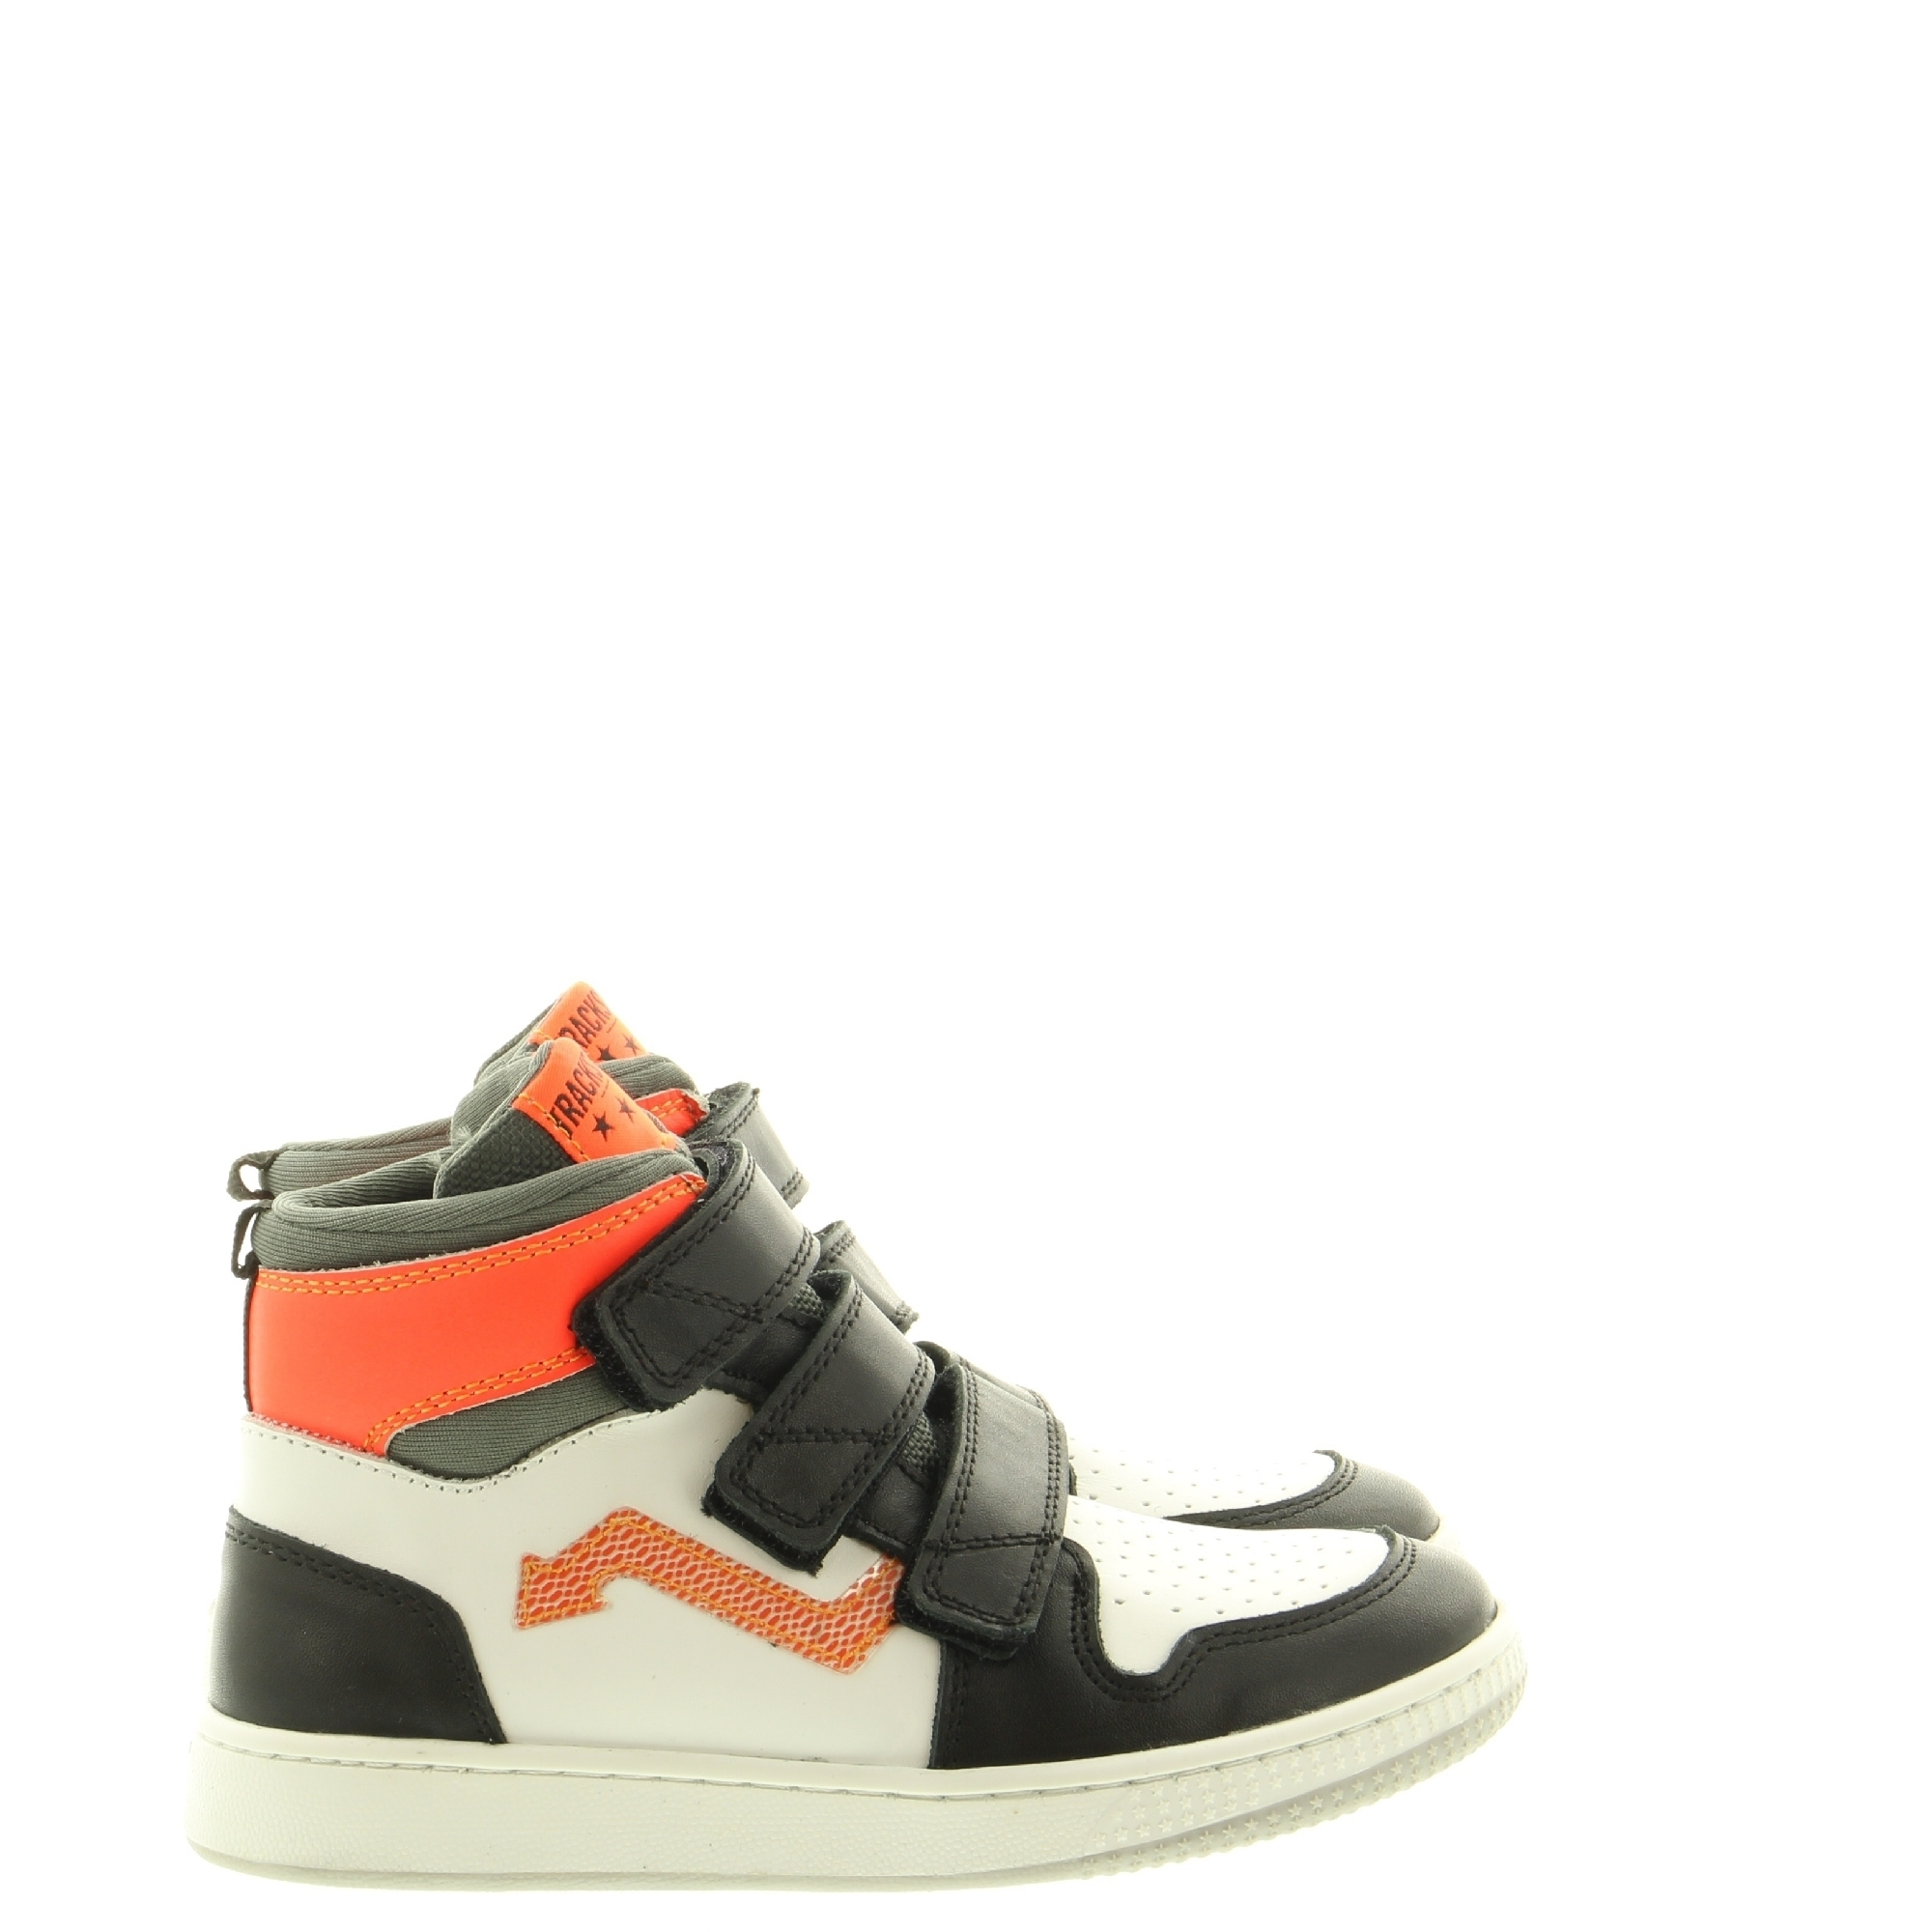 Twins Trackstyle 320858 189 Black White Orange